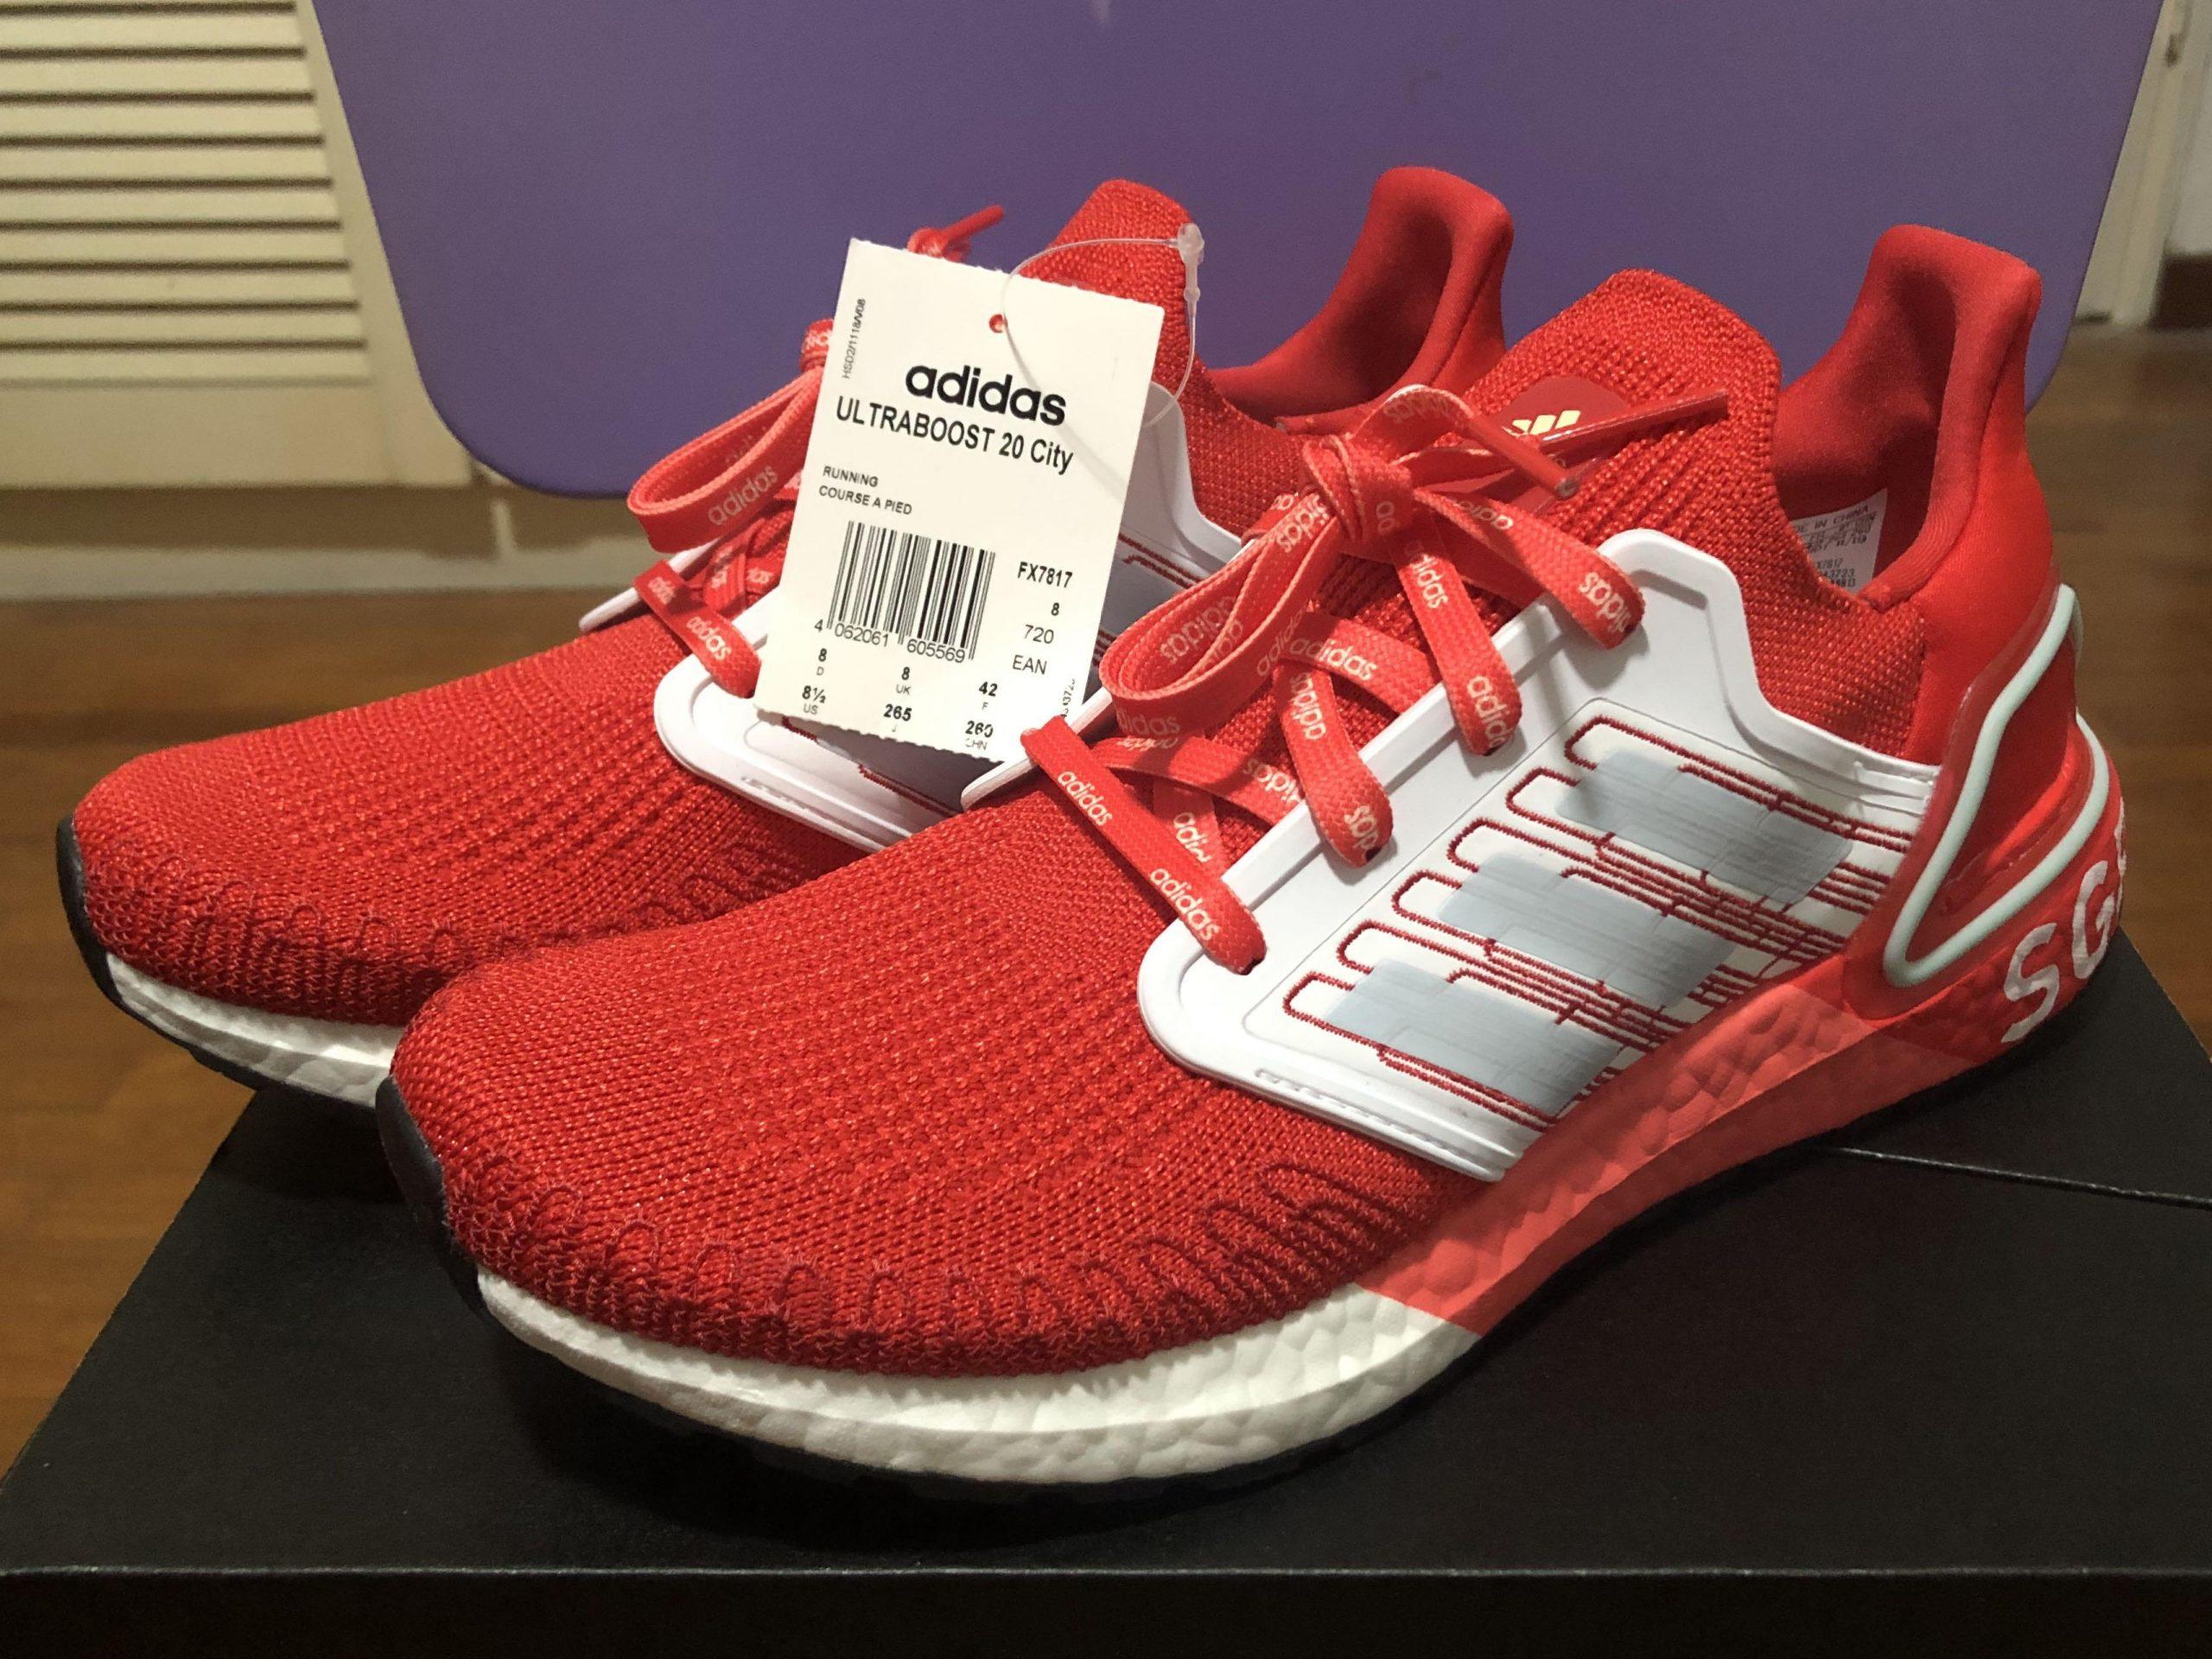 Adidas Ultra Boost 20 Singapore scaled